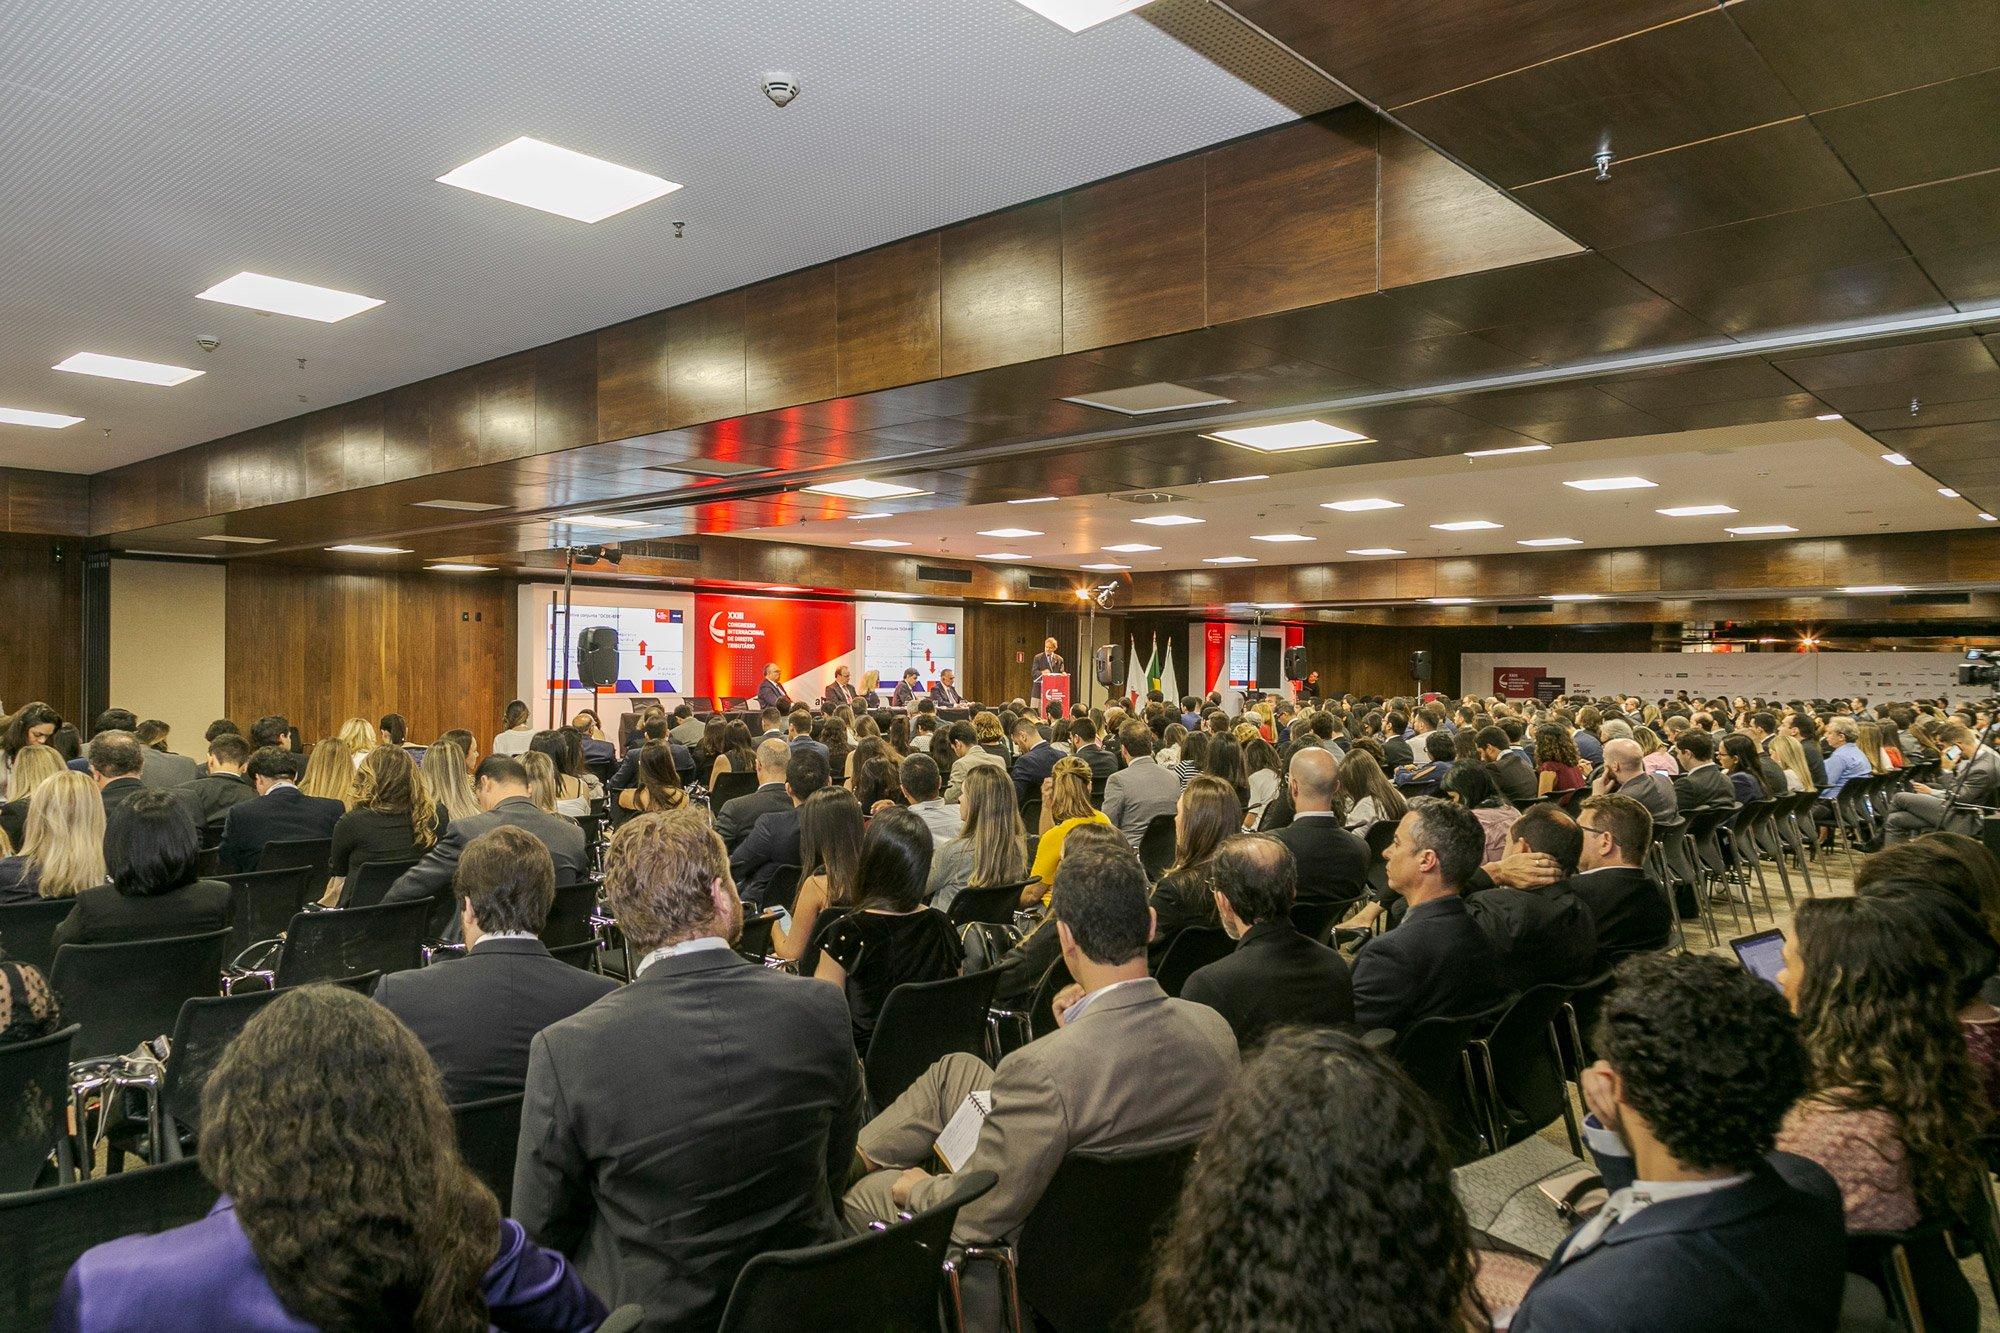 congresso-direito-tributario-abradt-2019-patrocinar-1